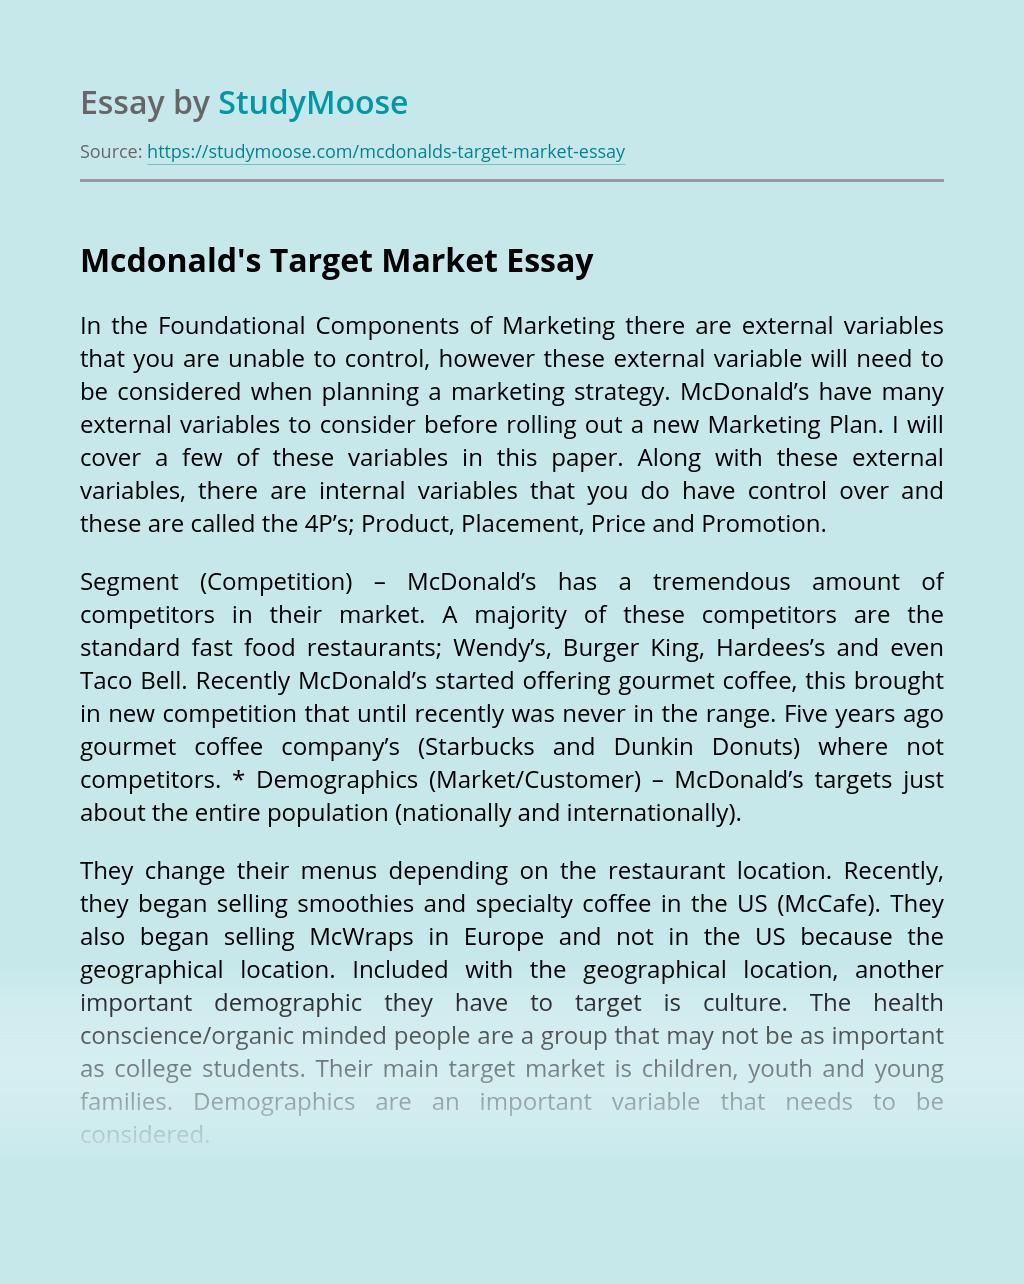 Mcdonald's Target Market